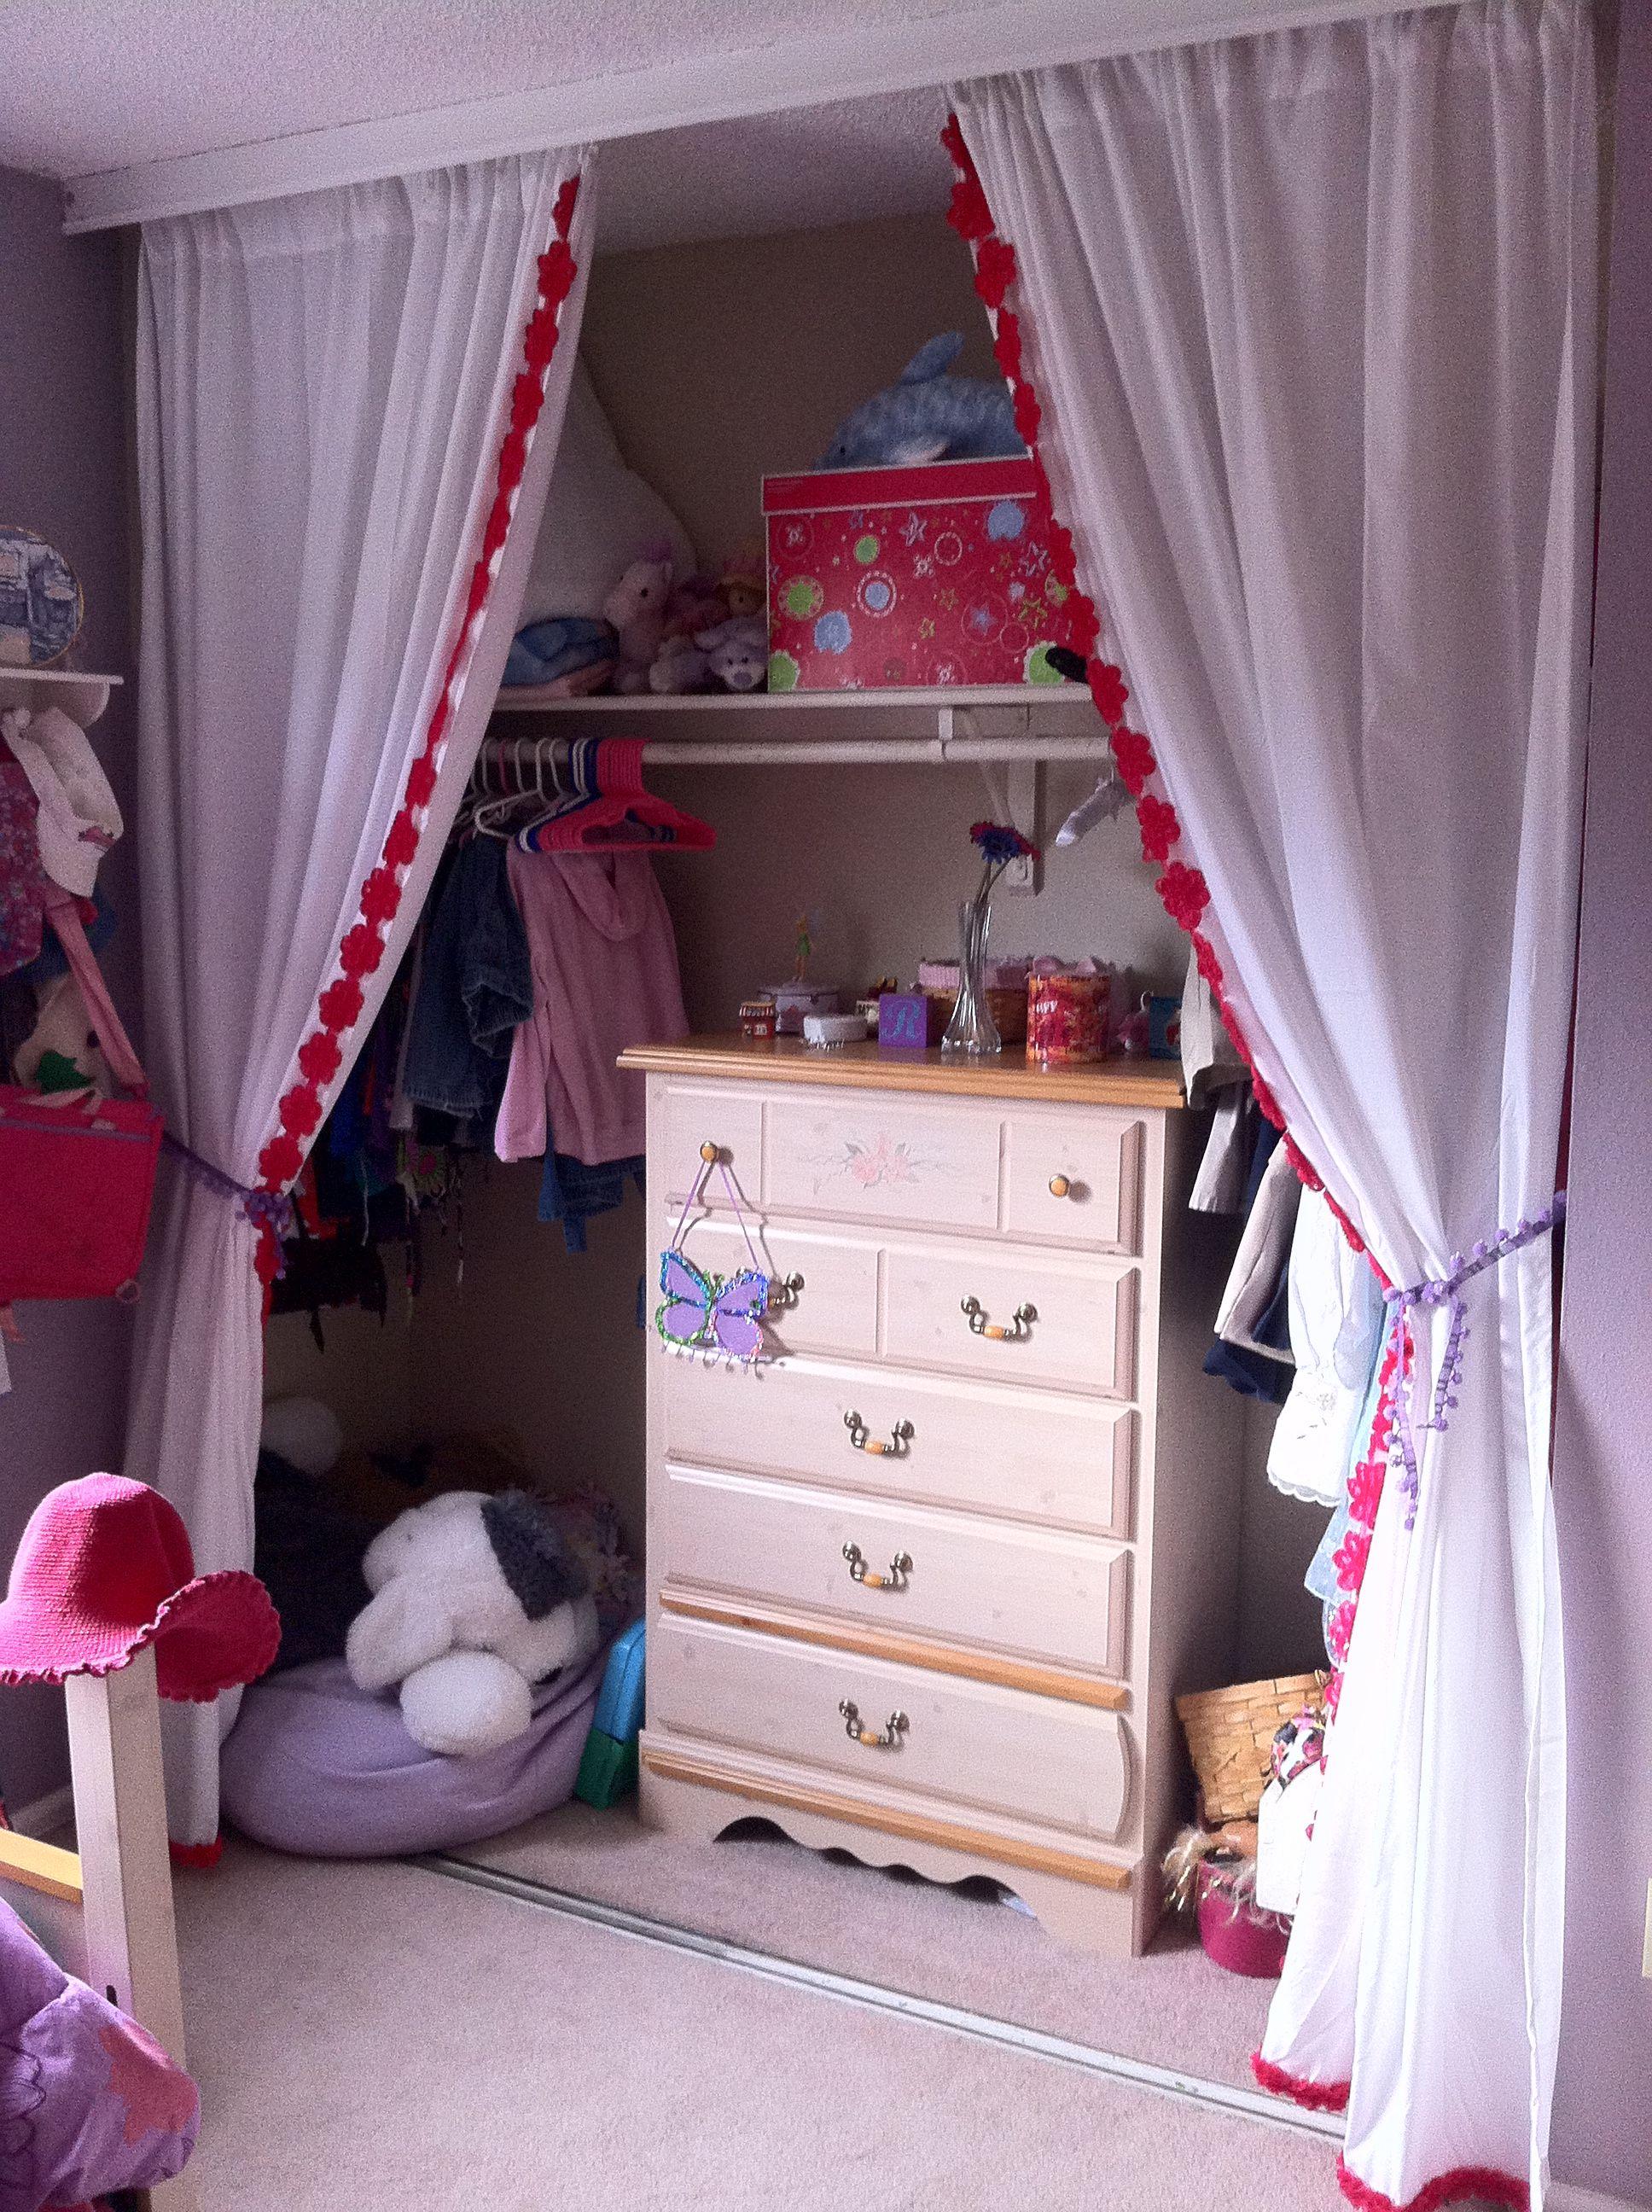 Closet curtains for kids - Closet Curtains